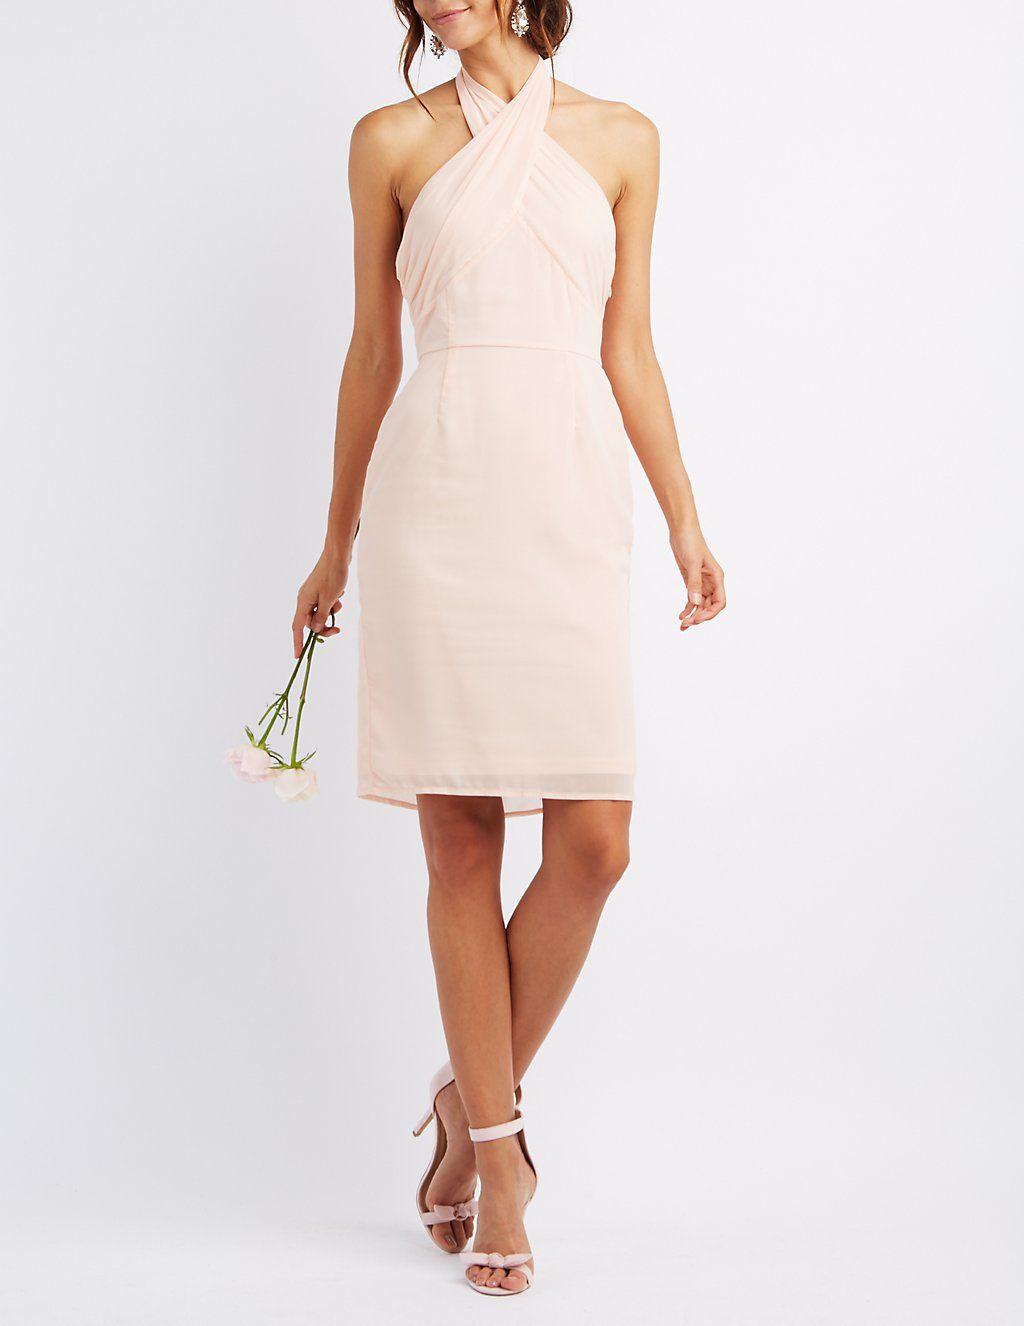 Chiffon Cross Front Halter Dress #CharlotteLook | Chocolate Trifle ...